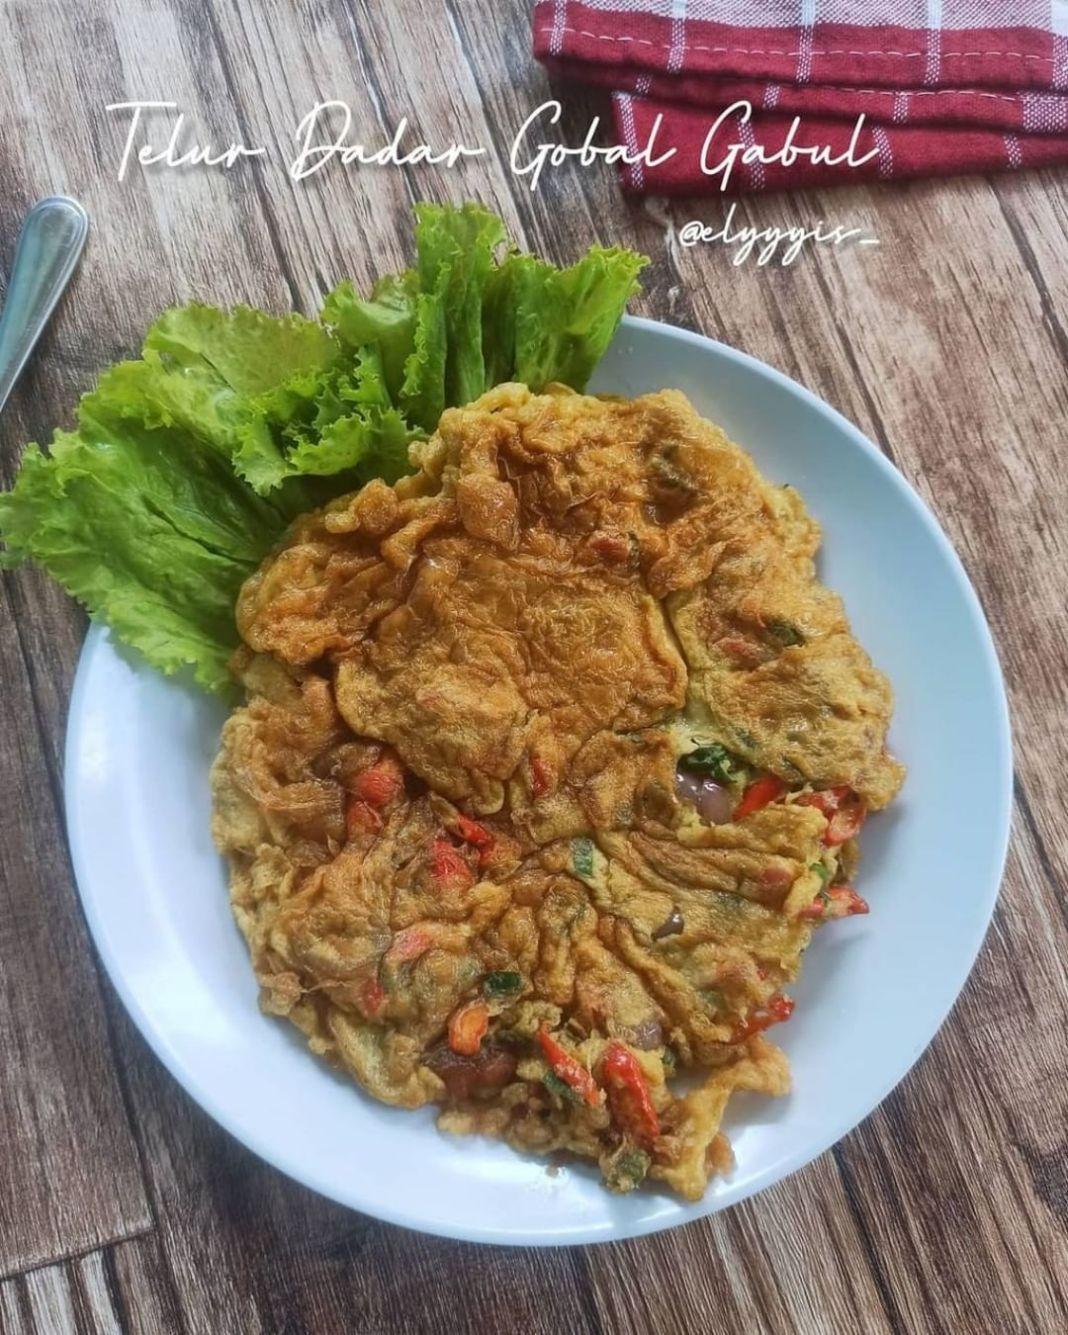 Info kuliner, sedep nih dimakan pake nasi angettt Kayak gini doang tapi ngabis ngabisin nasi loh.. ga percaya…